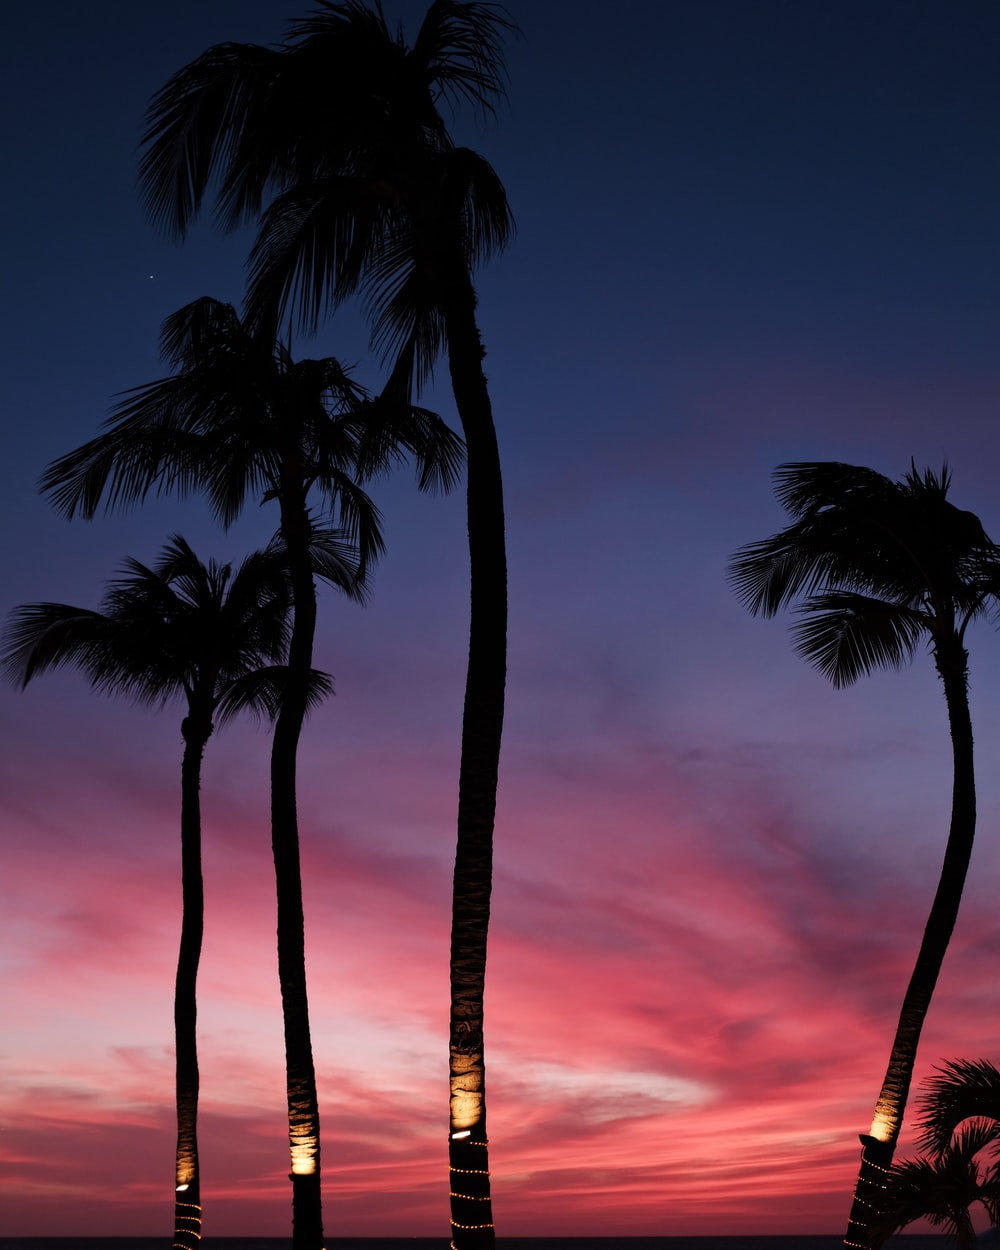 four coconut trees